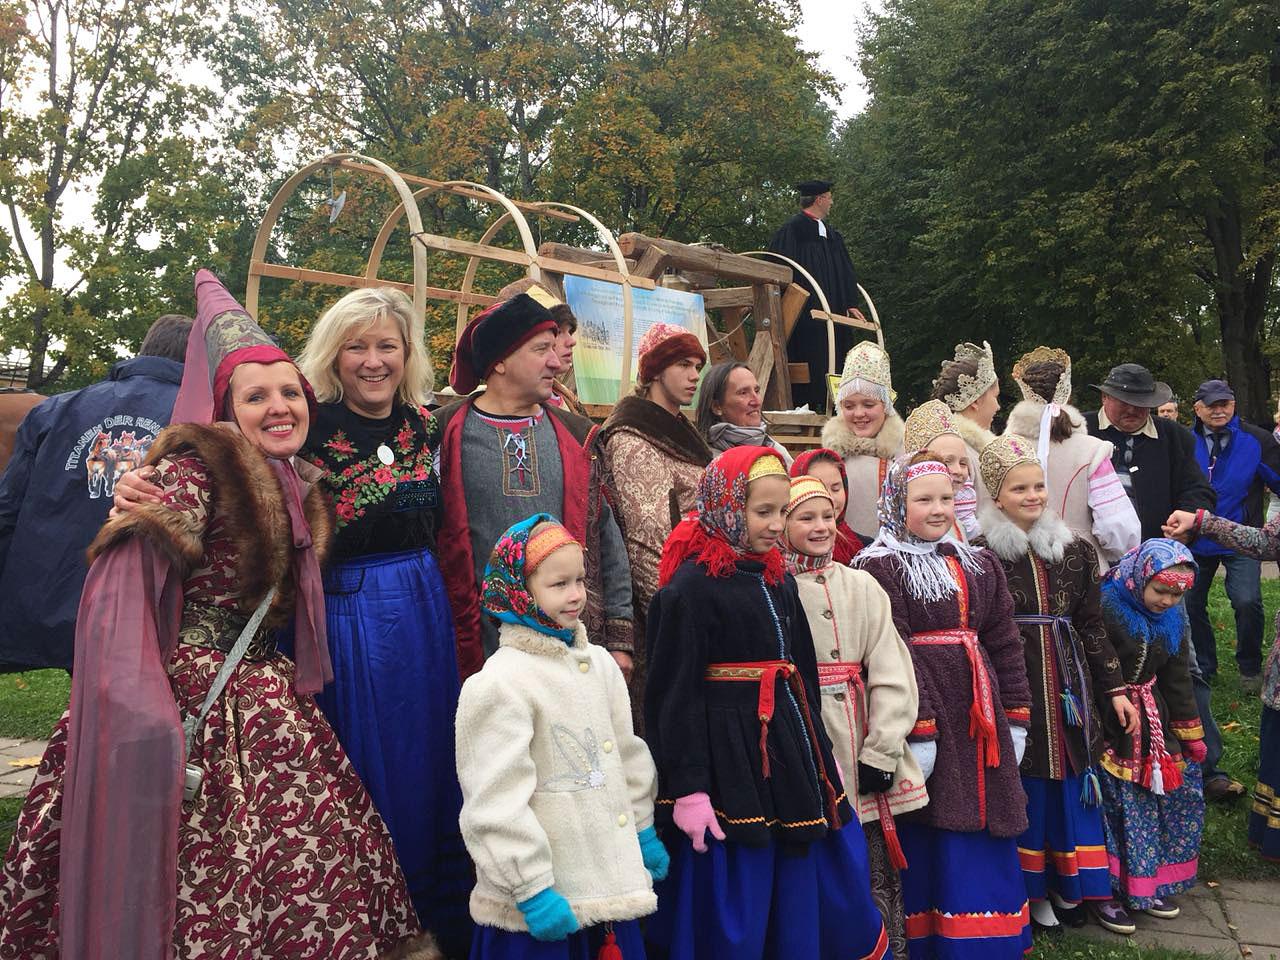 Fototermin am Glockenwagen - Titanen on tour in Weliki Nowgorod